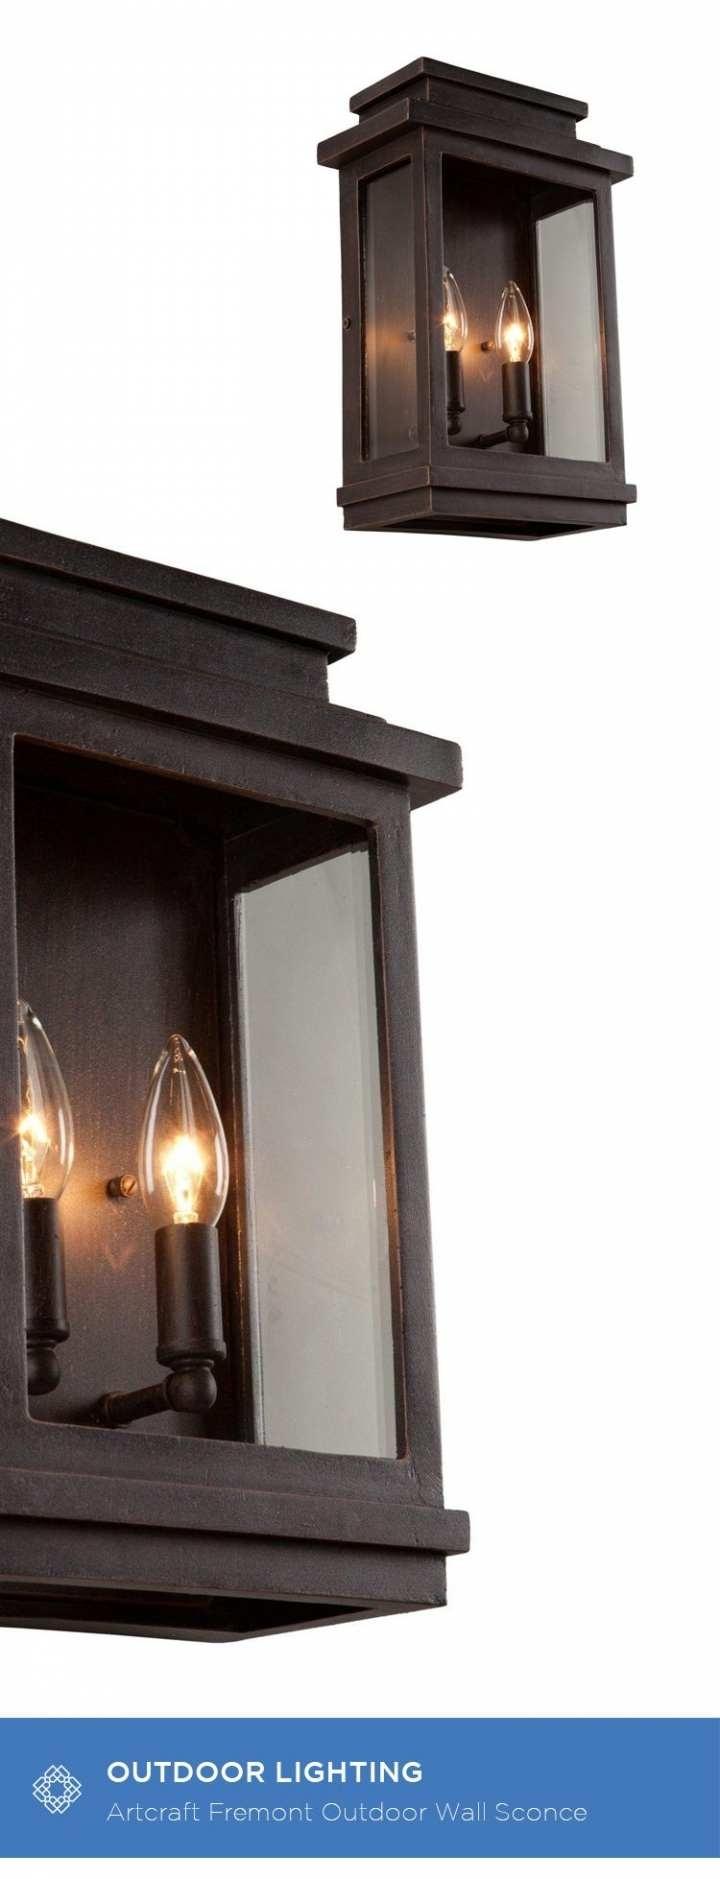 39 Magnificent Outdoor Gas Lanterns Snapshot | Outdoor Furniture regarding Outdoor Gas Lanterns (Image 1 of 20)